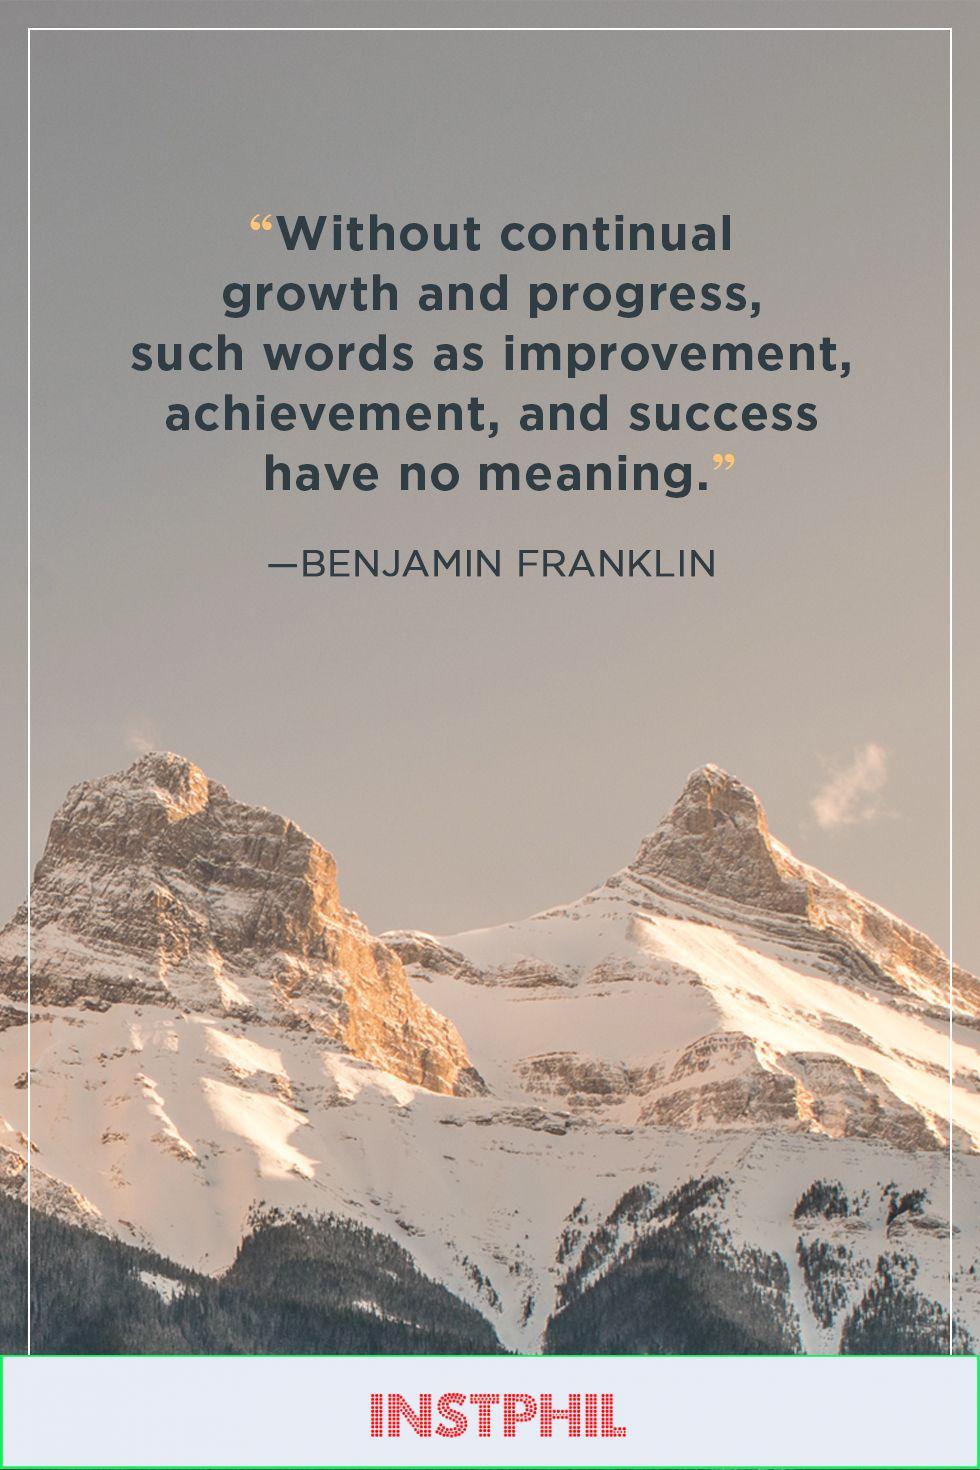 benjamin franklin success quote